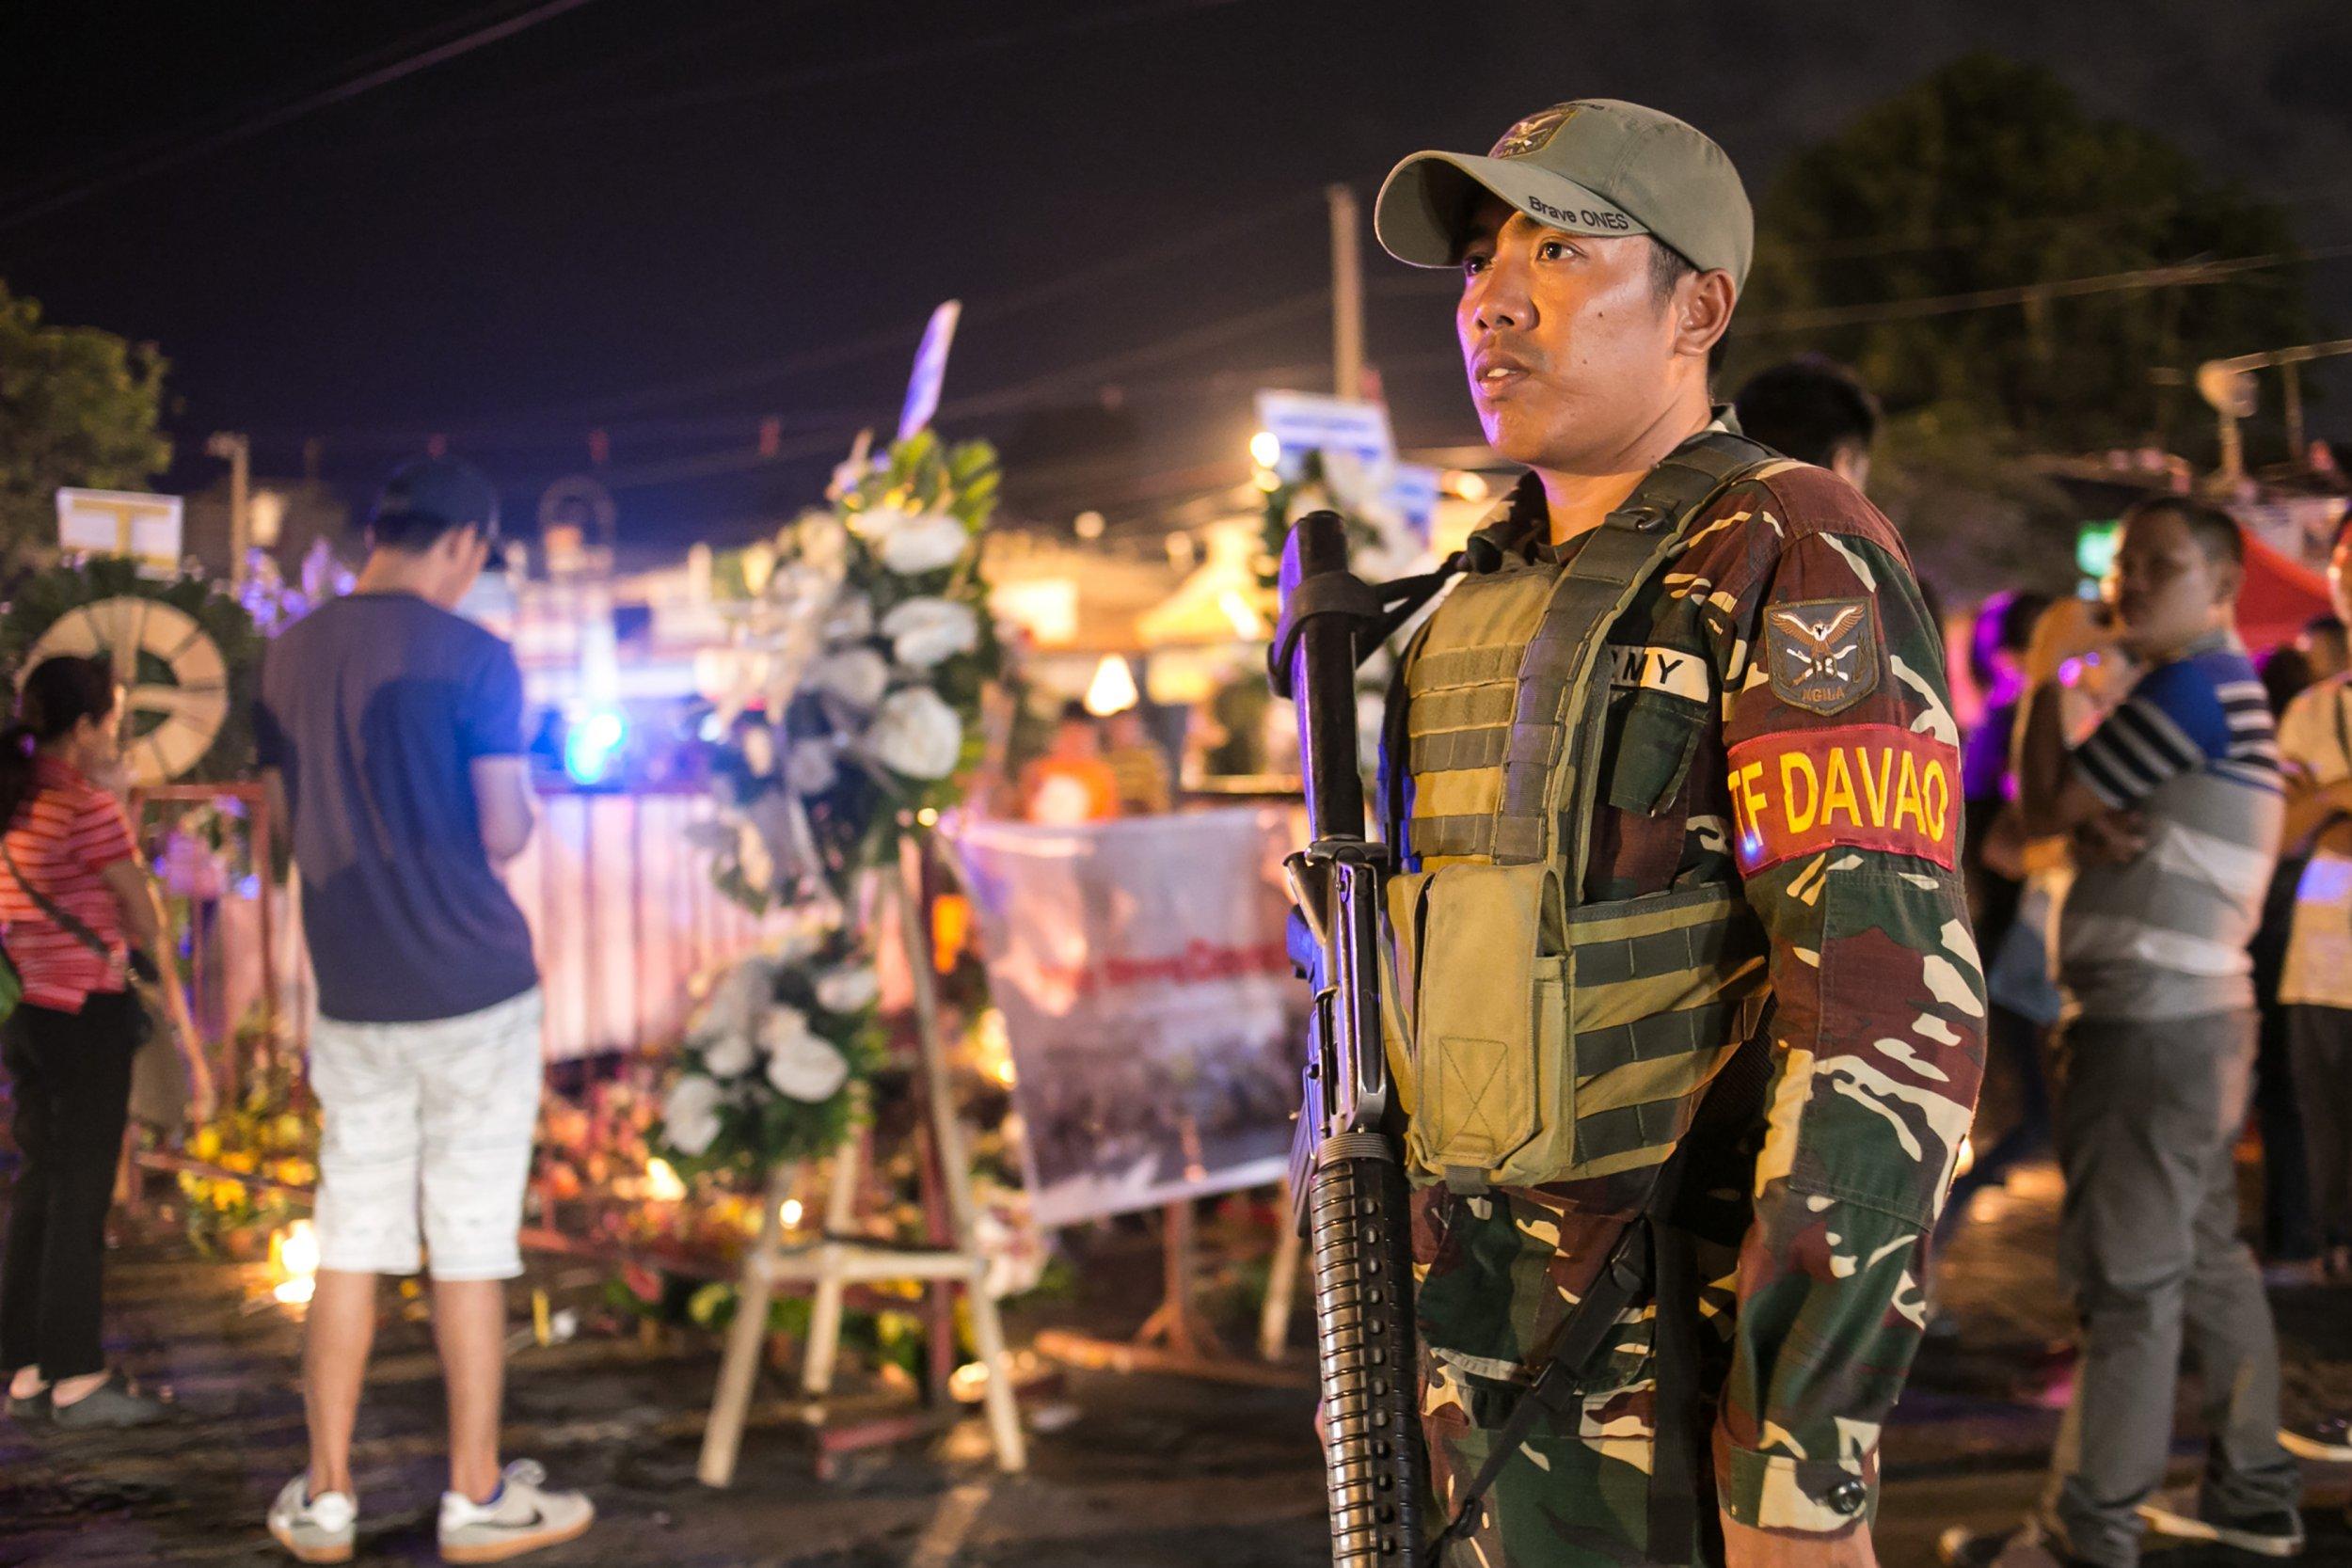 Davao City soldier